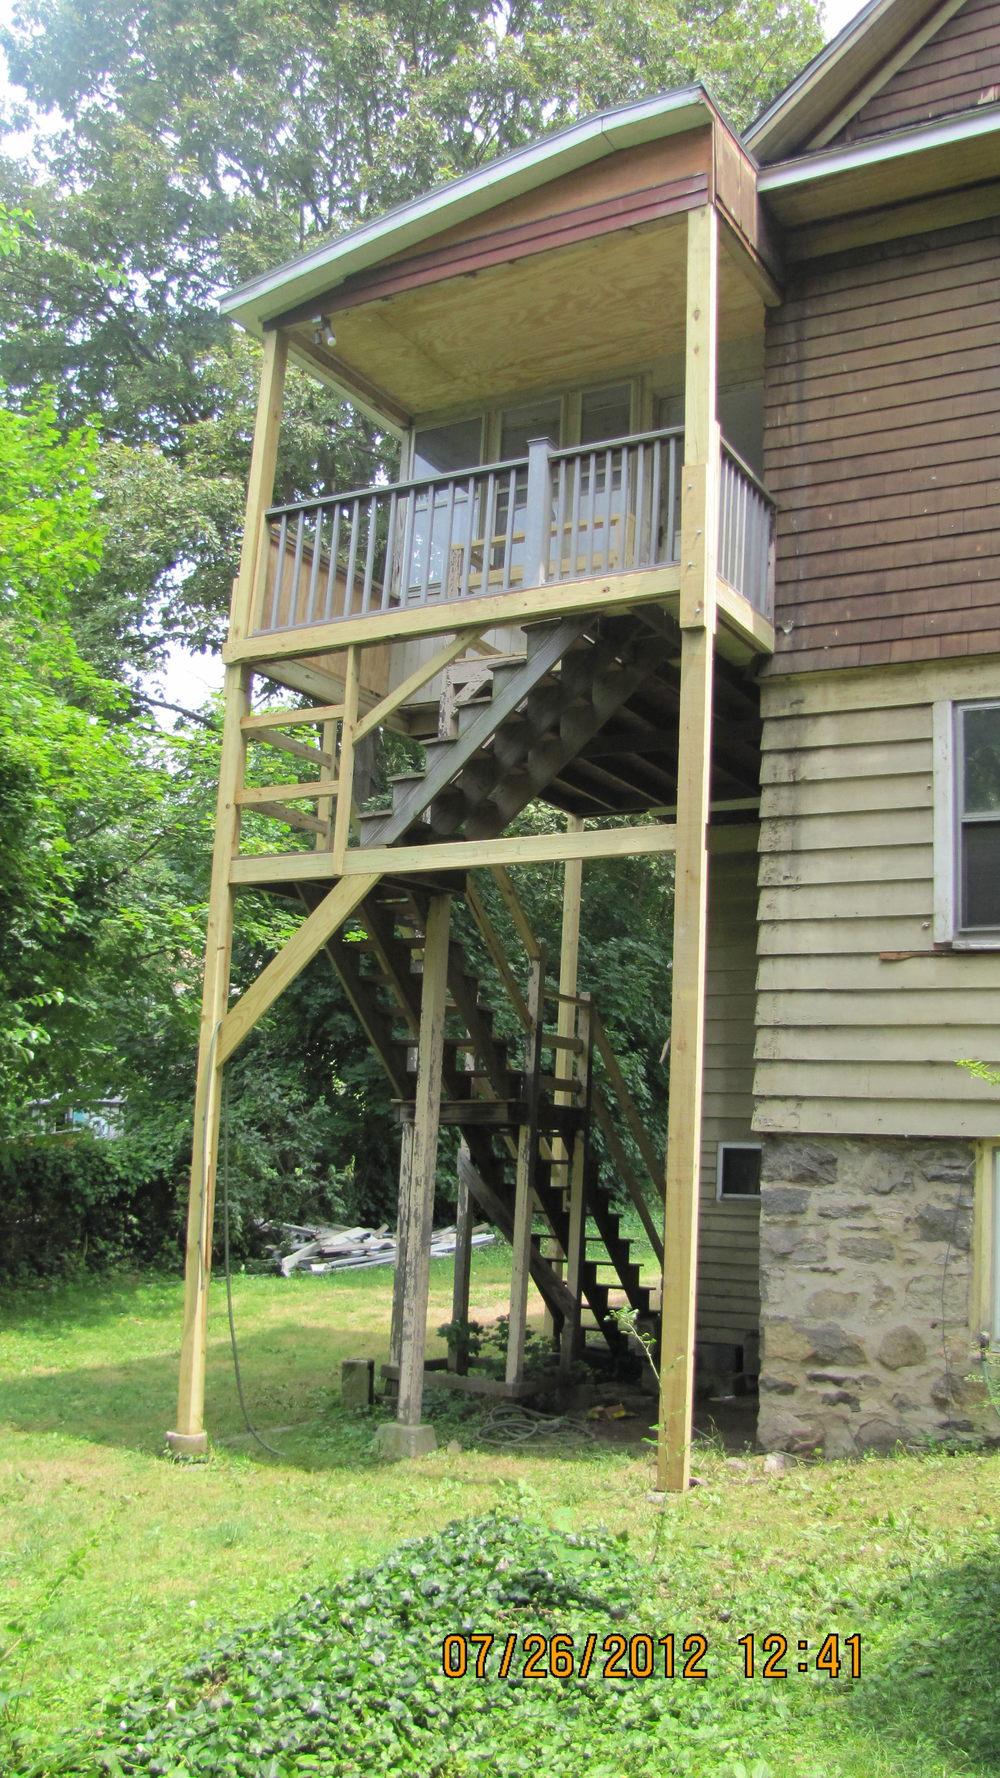 Extreme Make Over Prime Home Improvements White Plains NY_0723.jpg